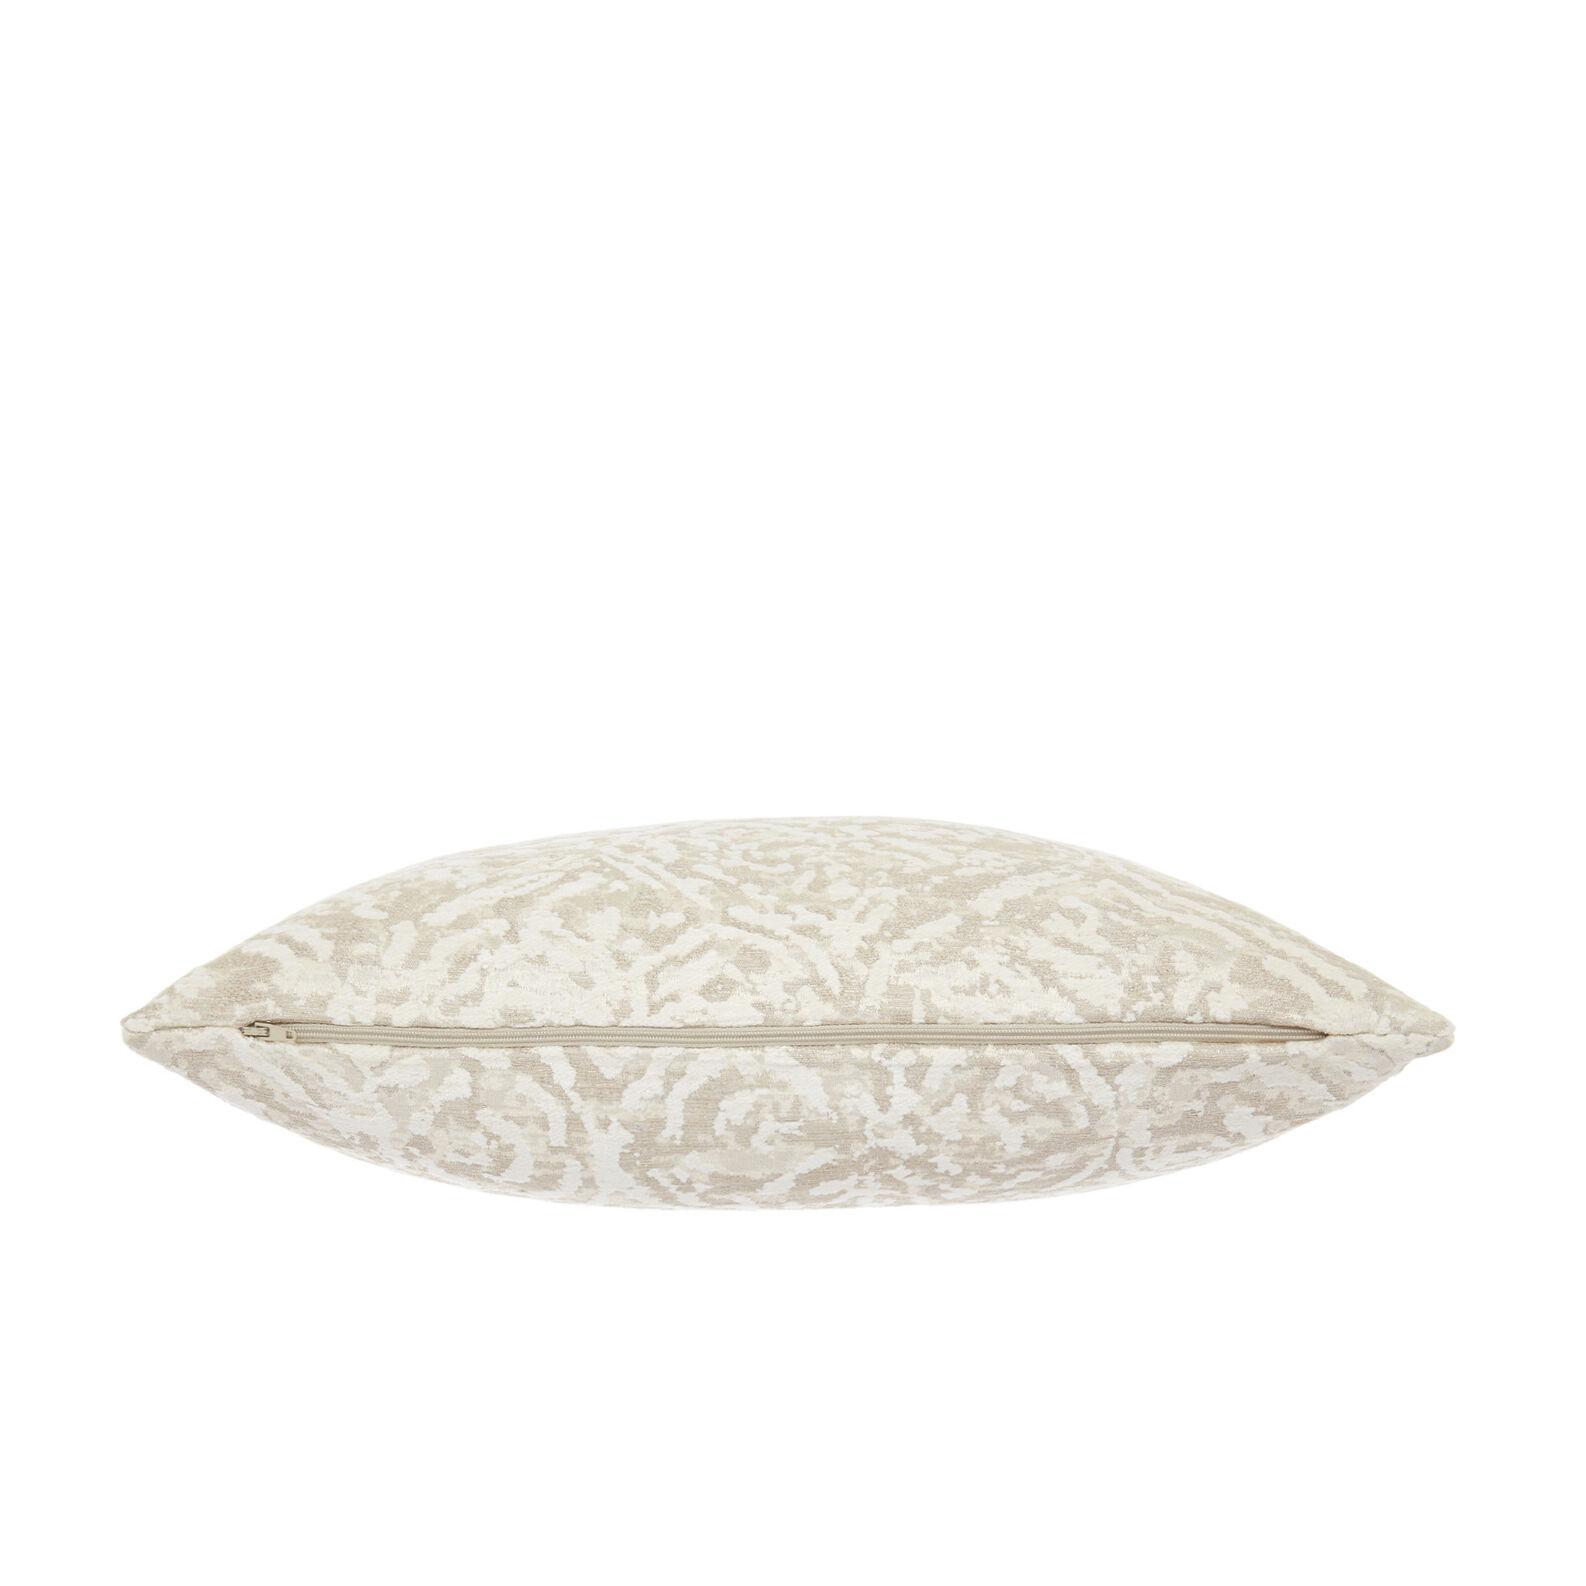 Jacquard fabric cushion with elegant patterns